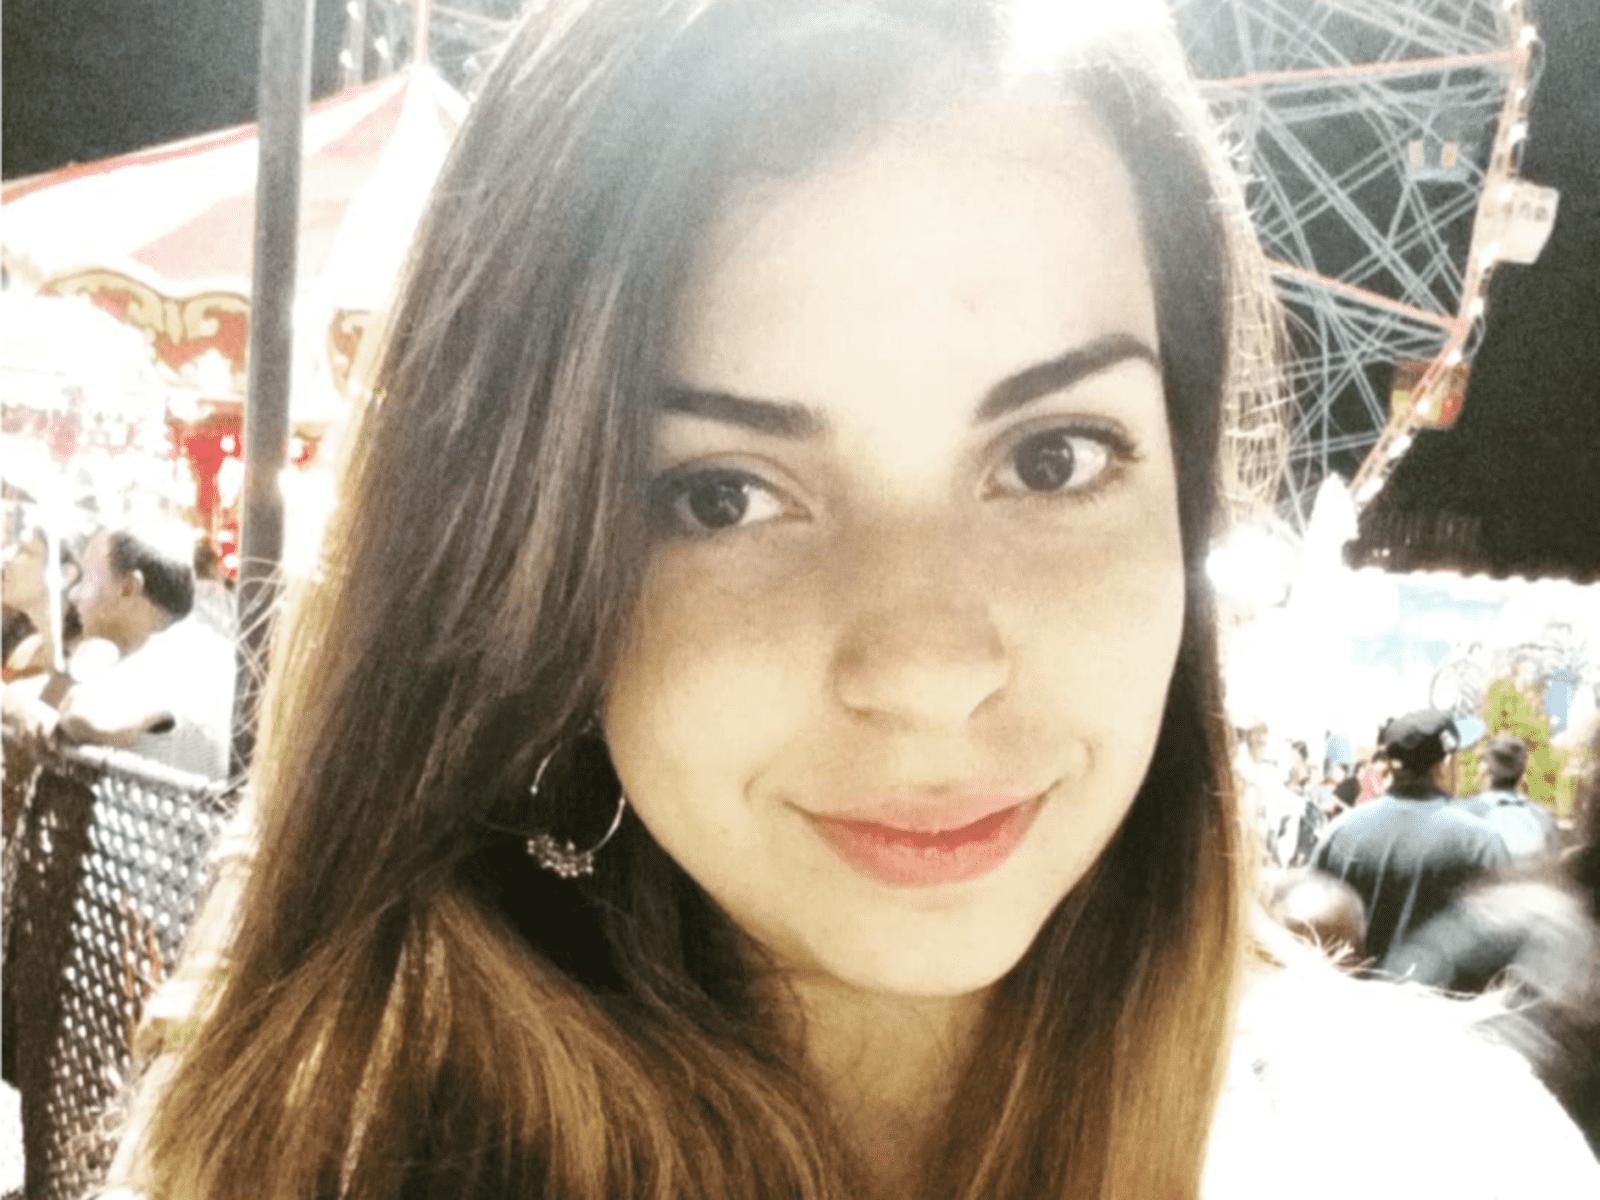 Mariana from Long Island City, New York, United States